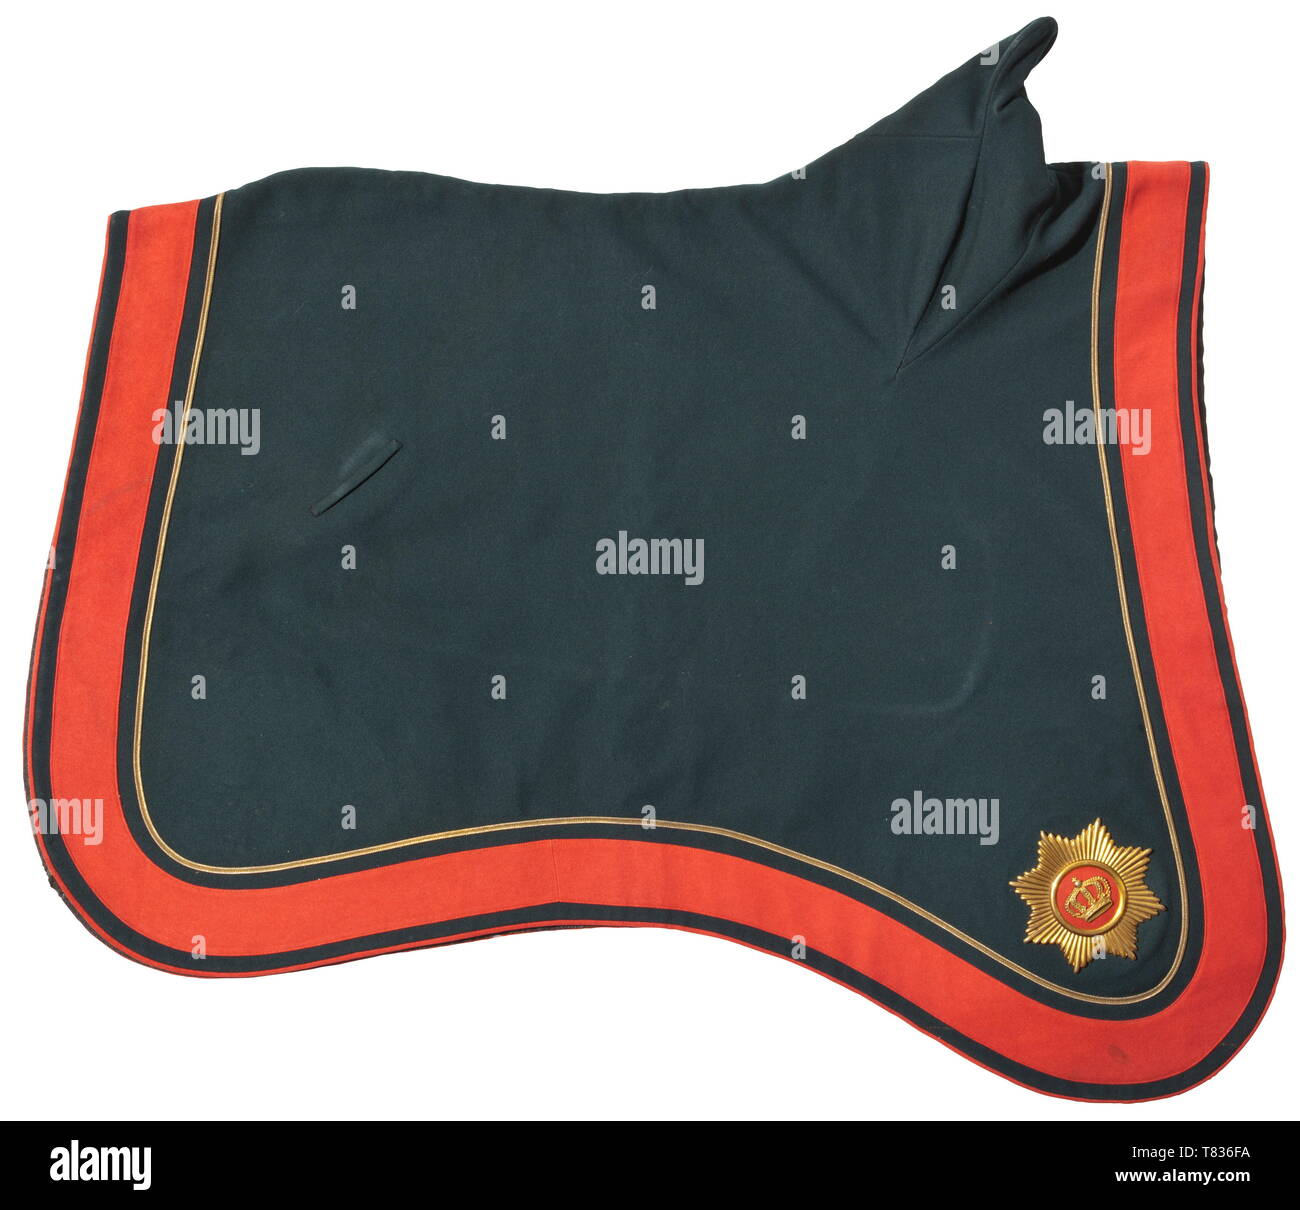 Saddle Cloth Stock Photos & Saddle Cloth Stock Images - Alamy